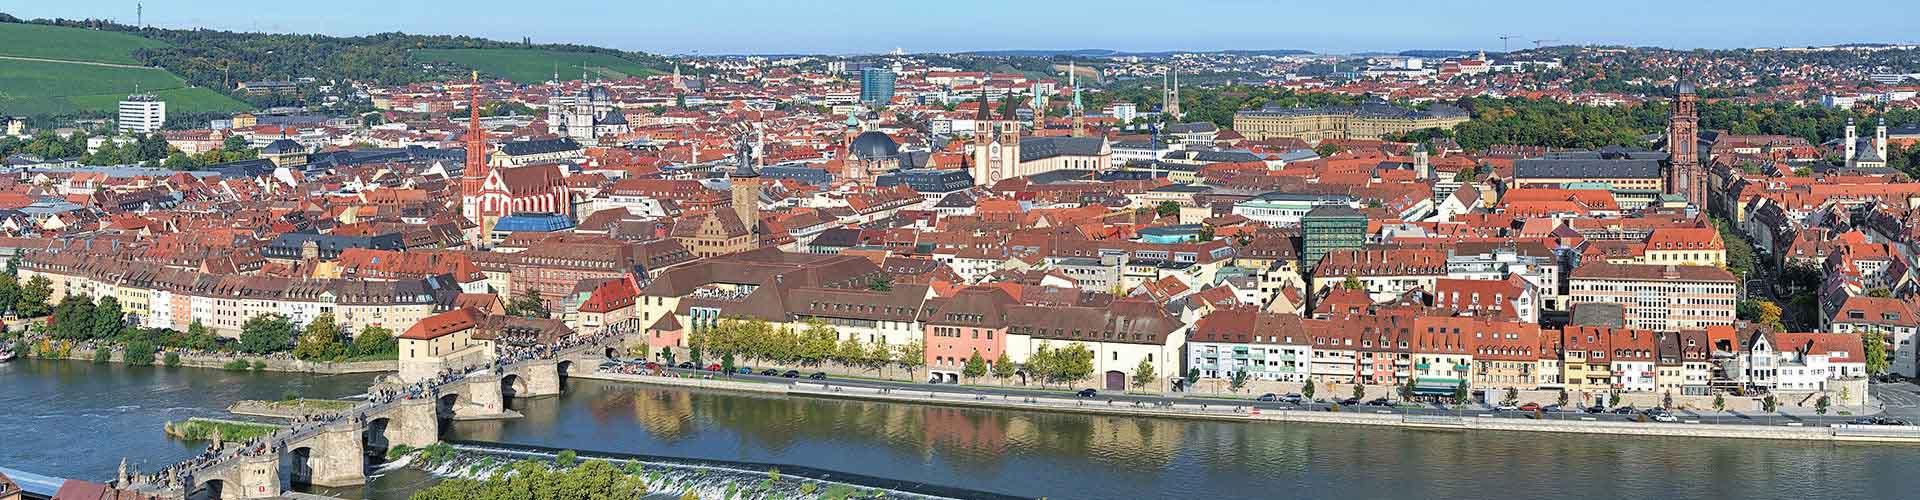 Wuerzburg - Hoteles baratos en Wuerzburg. Mapas de Wuerzburg, Fotos y Comentarios para cada alojamiento en Wuerzburg.